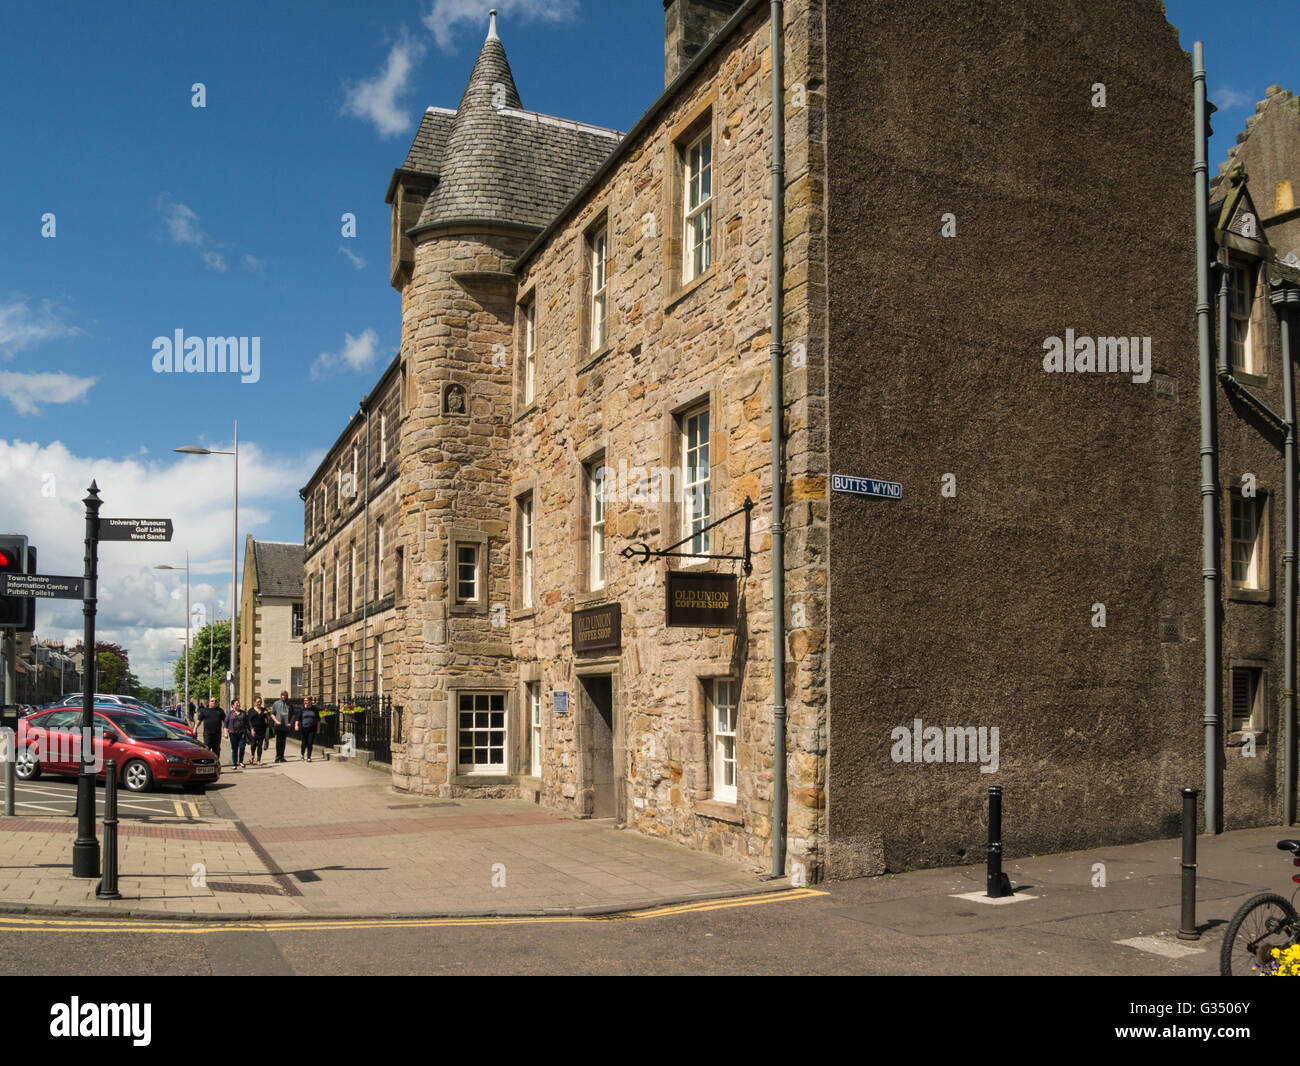 Alte Union Coffee Shop North Street Royal Burgh St Andrews Fife in Schottland durch Students Association Profite Stockbild